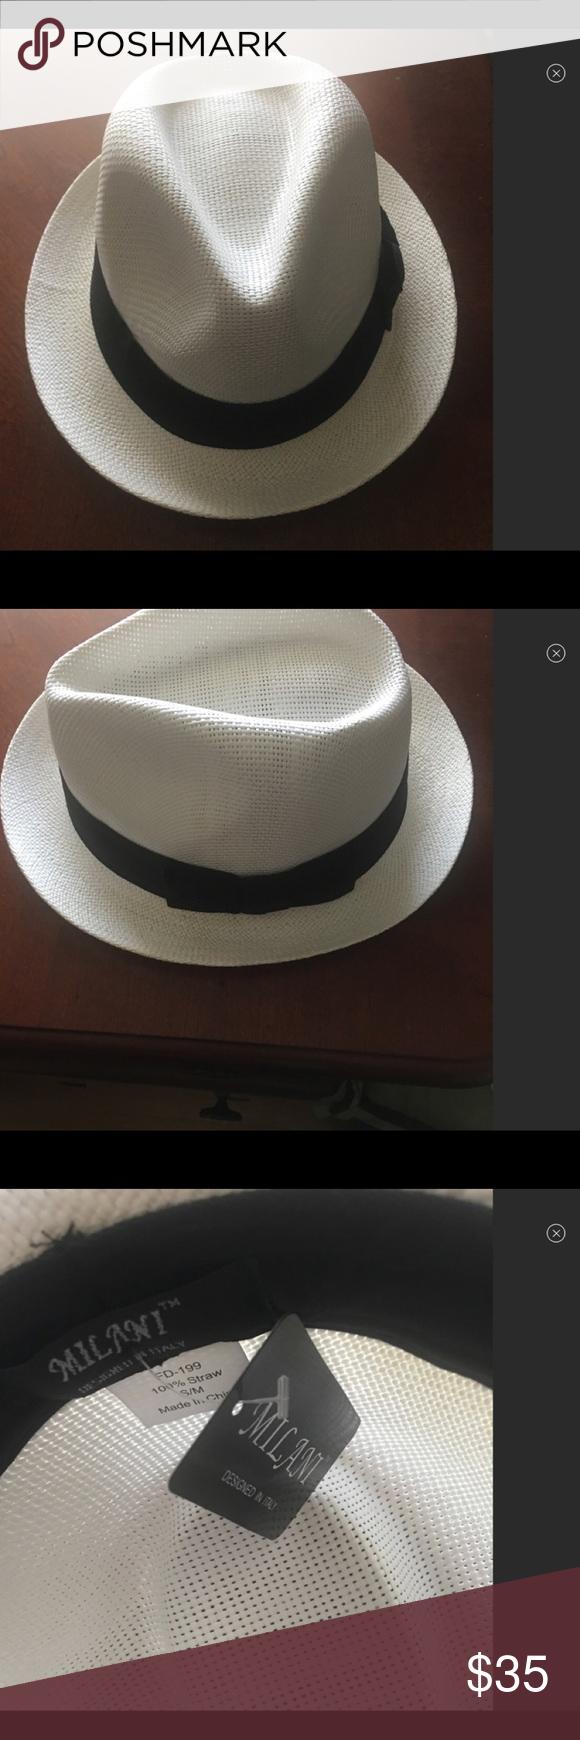 a46dfa03125f5 Spotted while shopping on Poshmark  Fedora Hat 100% Straw 🦋🎩NWT Milani  White!  poshmark  fashion  shopping  style  Milani  Other